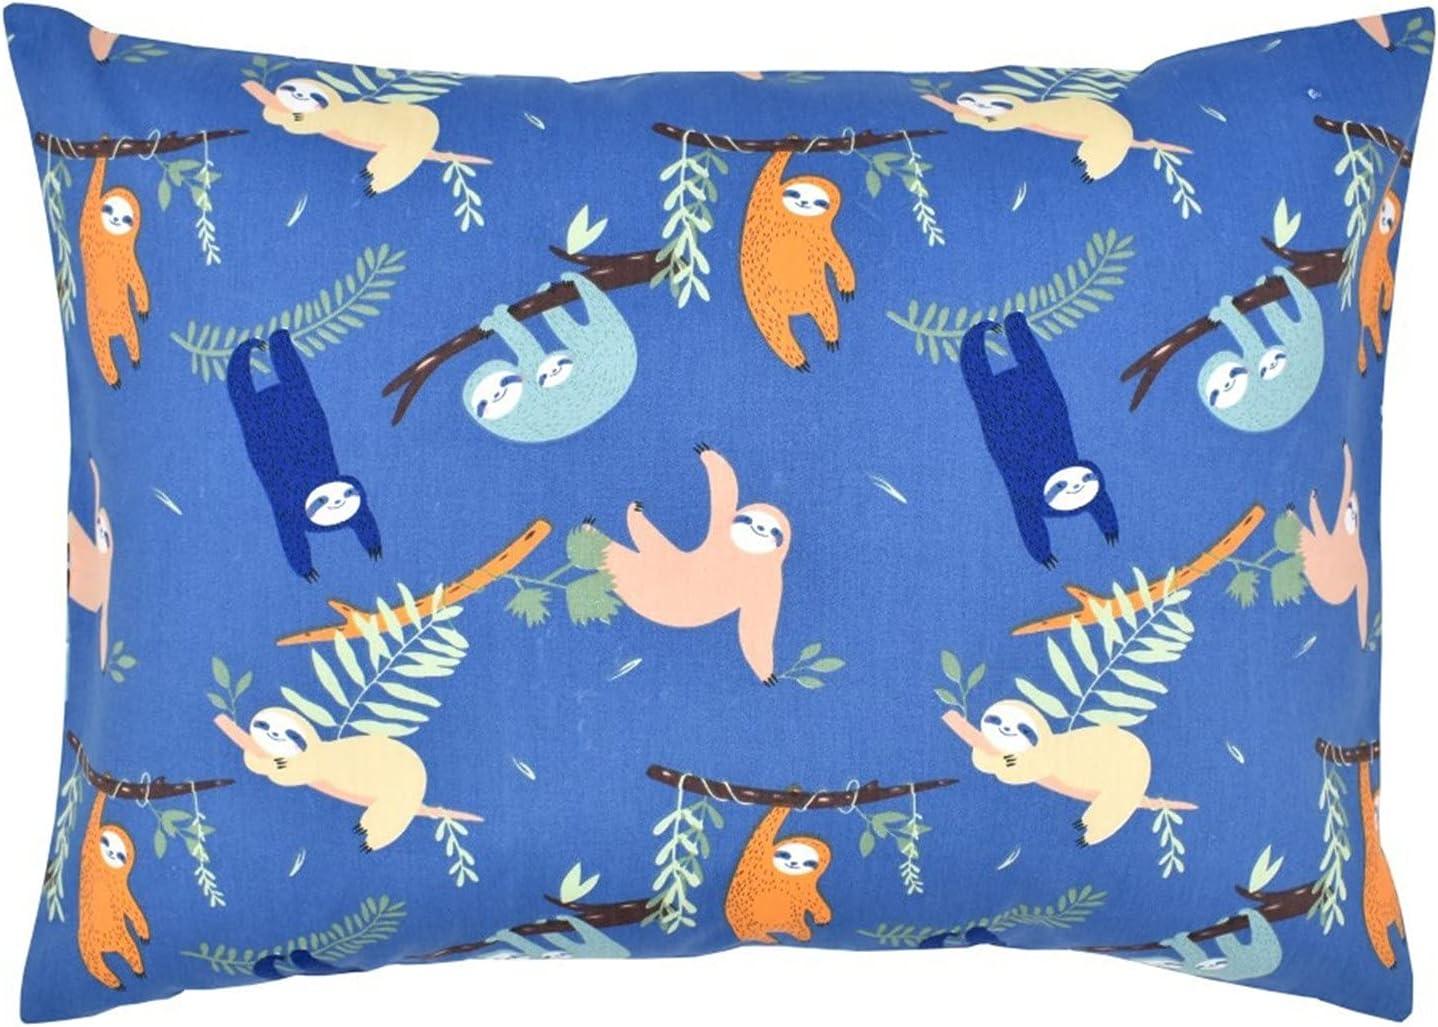 Children's Toddler Award Cheap Pillowcase 2 Pack 100% Organic Cotton Baby Pi